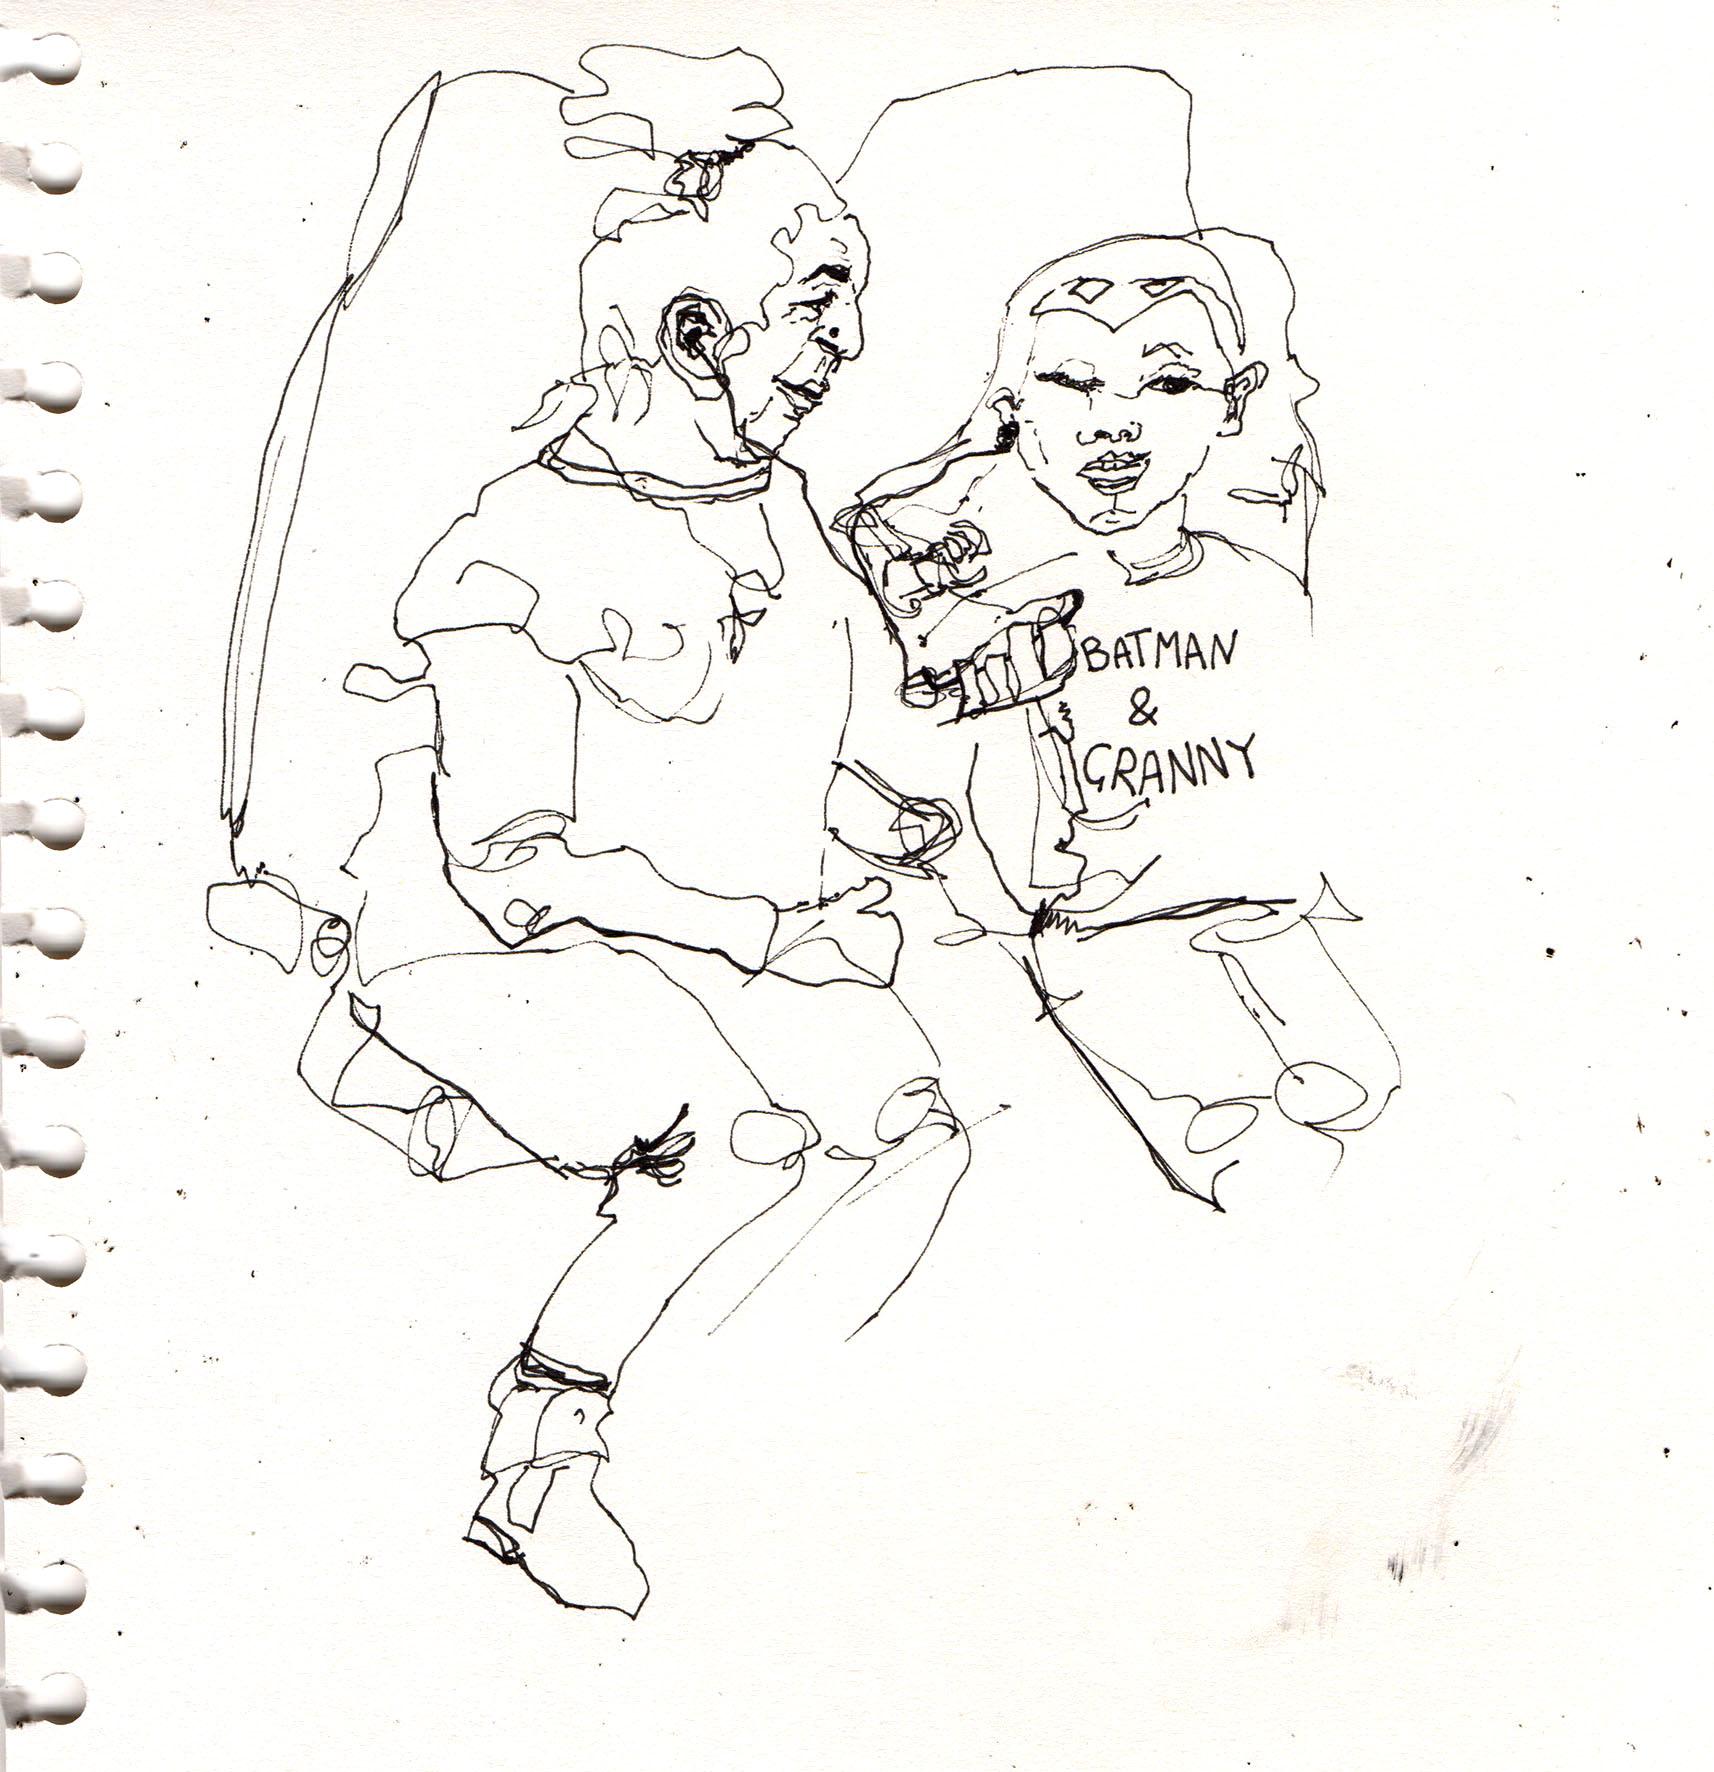 Whiten_batman granny_drawing_illustration.jpeg